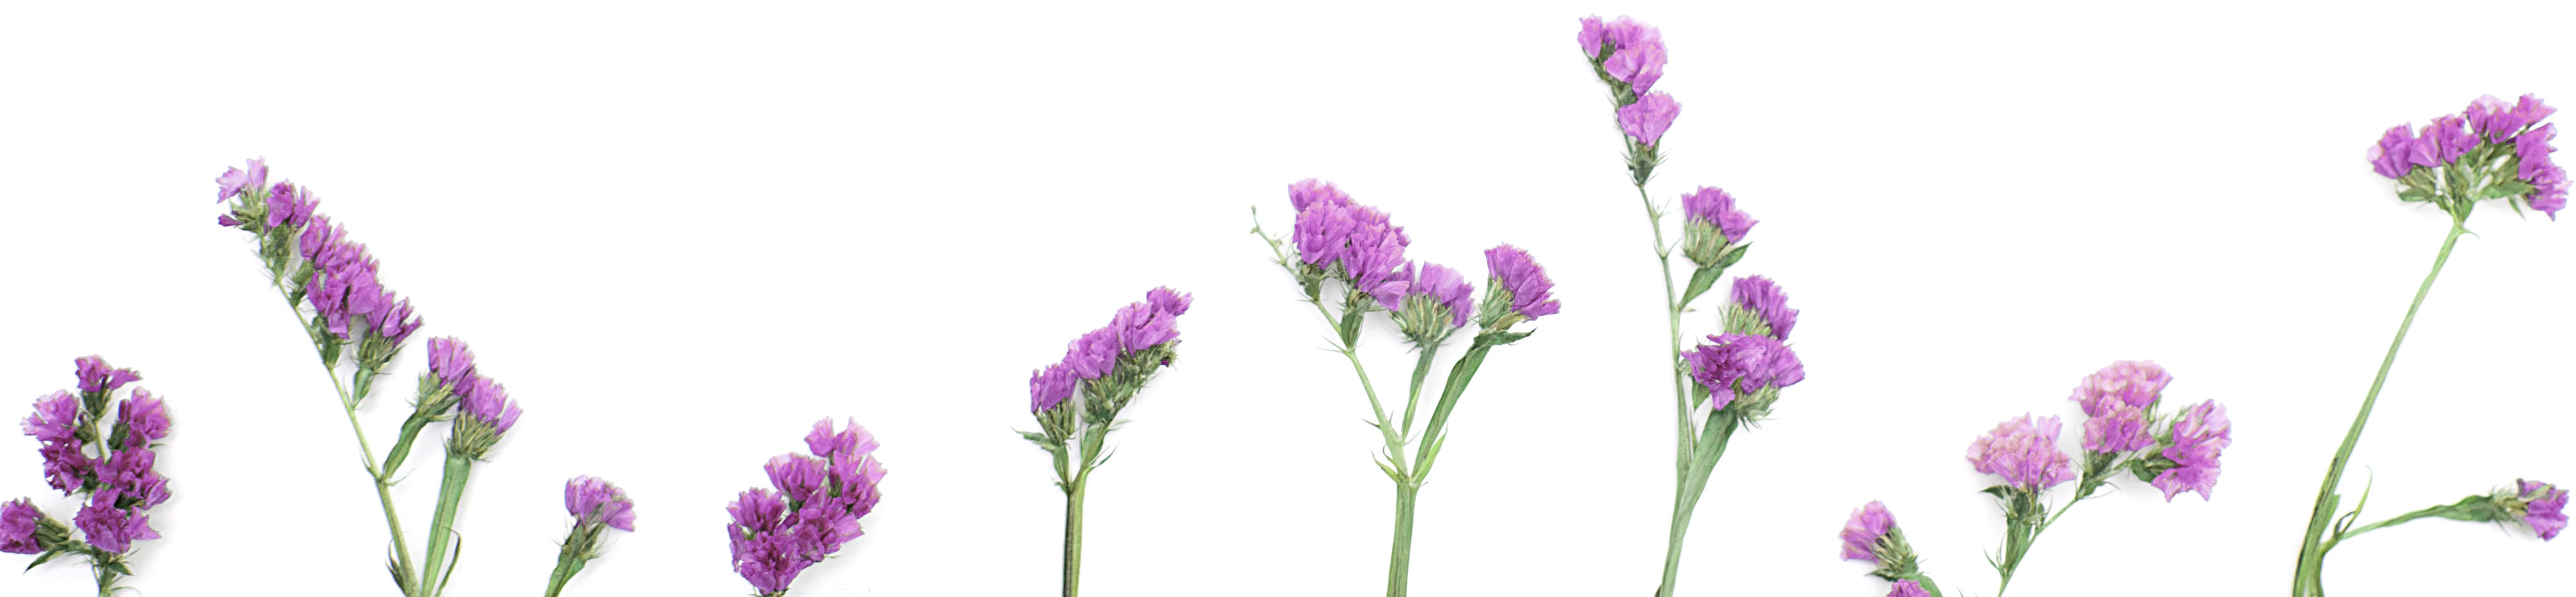 bottom-row-purple-flowers